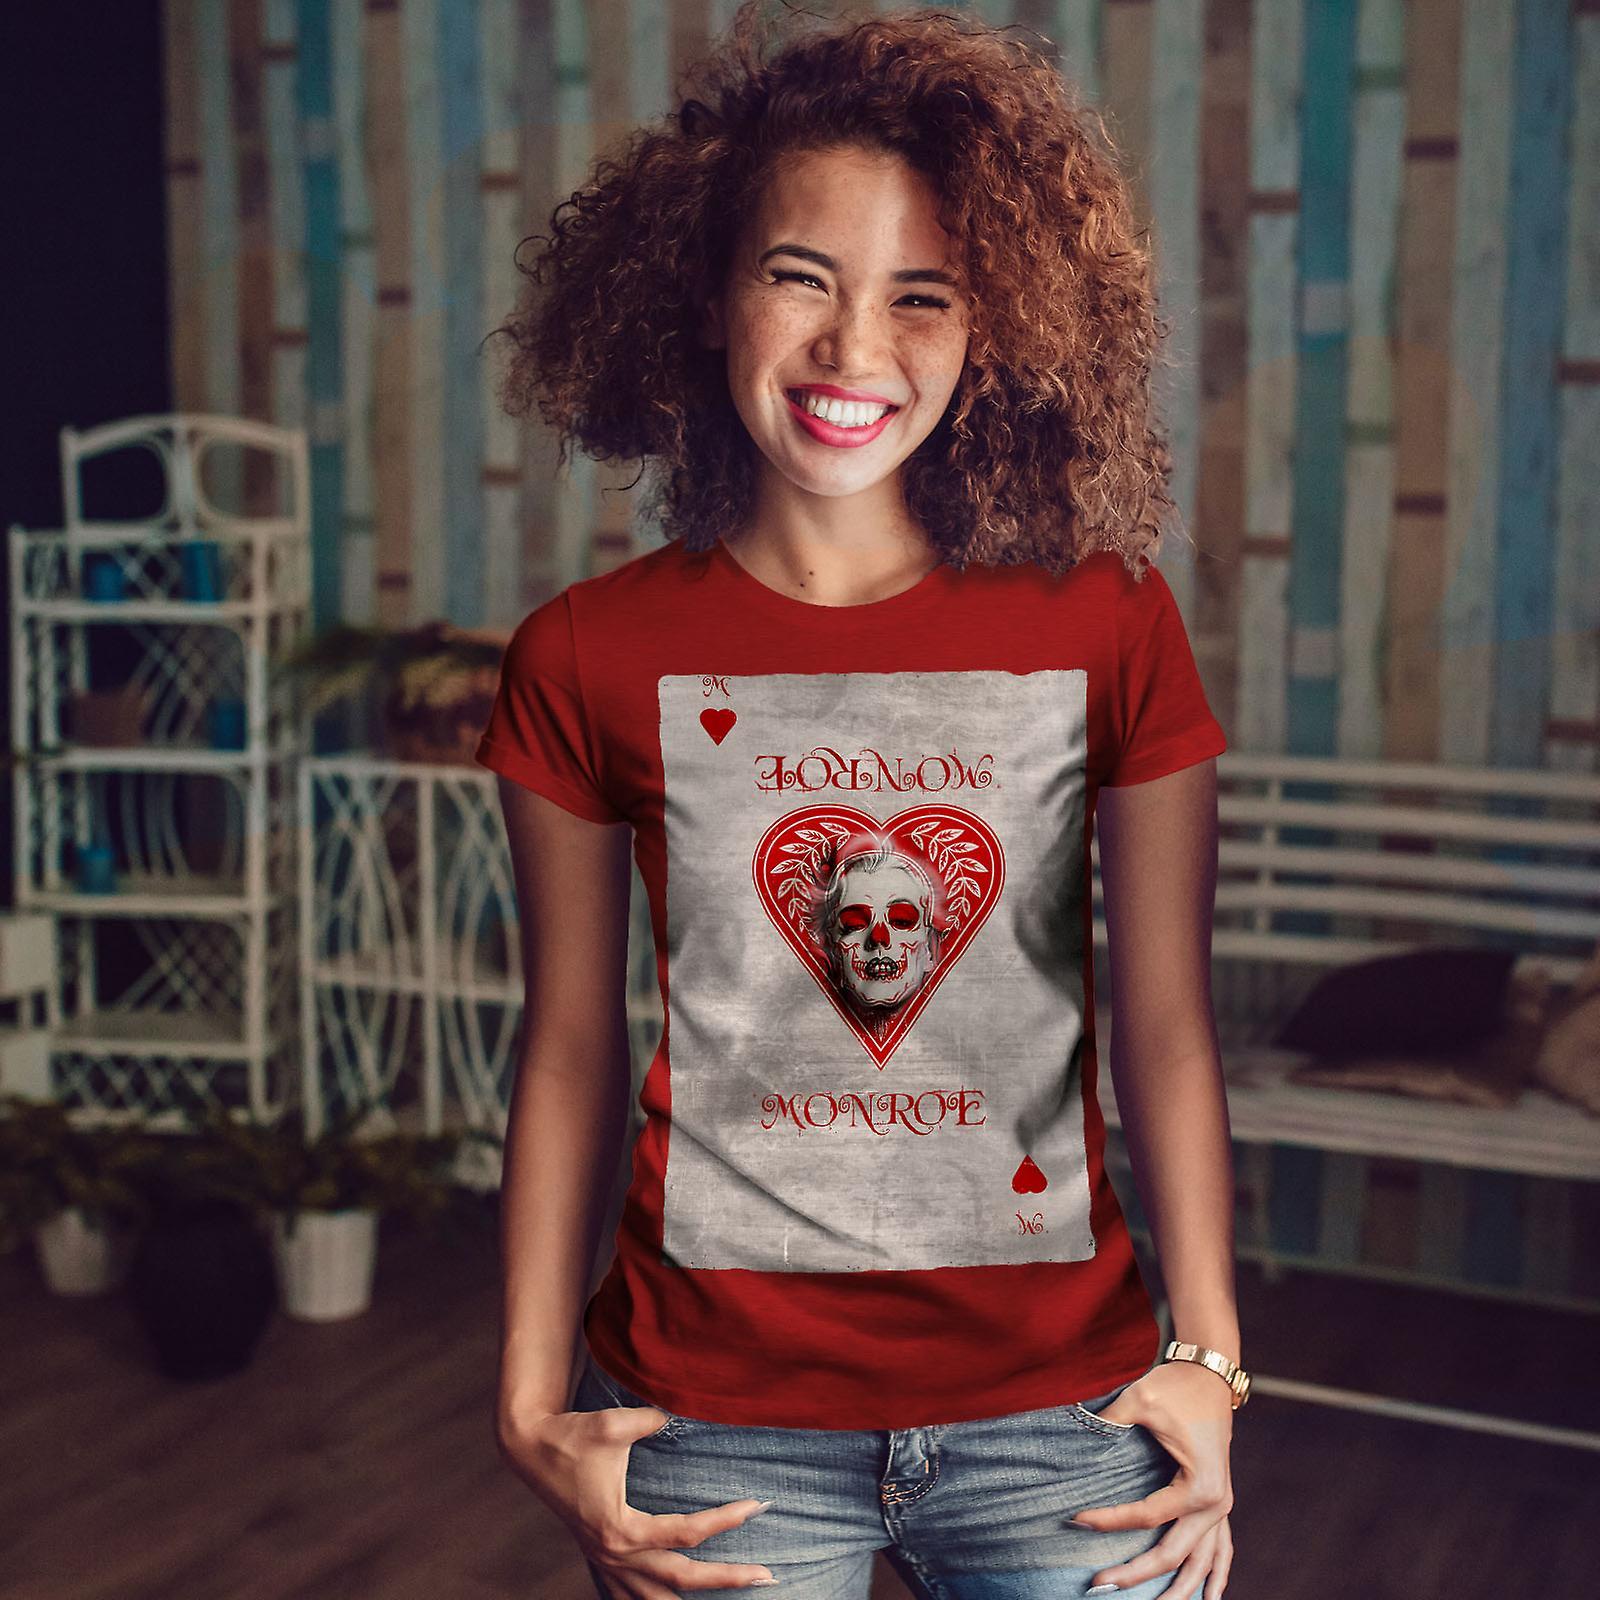 Coeur carte RedT-chemise femme   Wellcoda